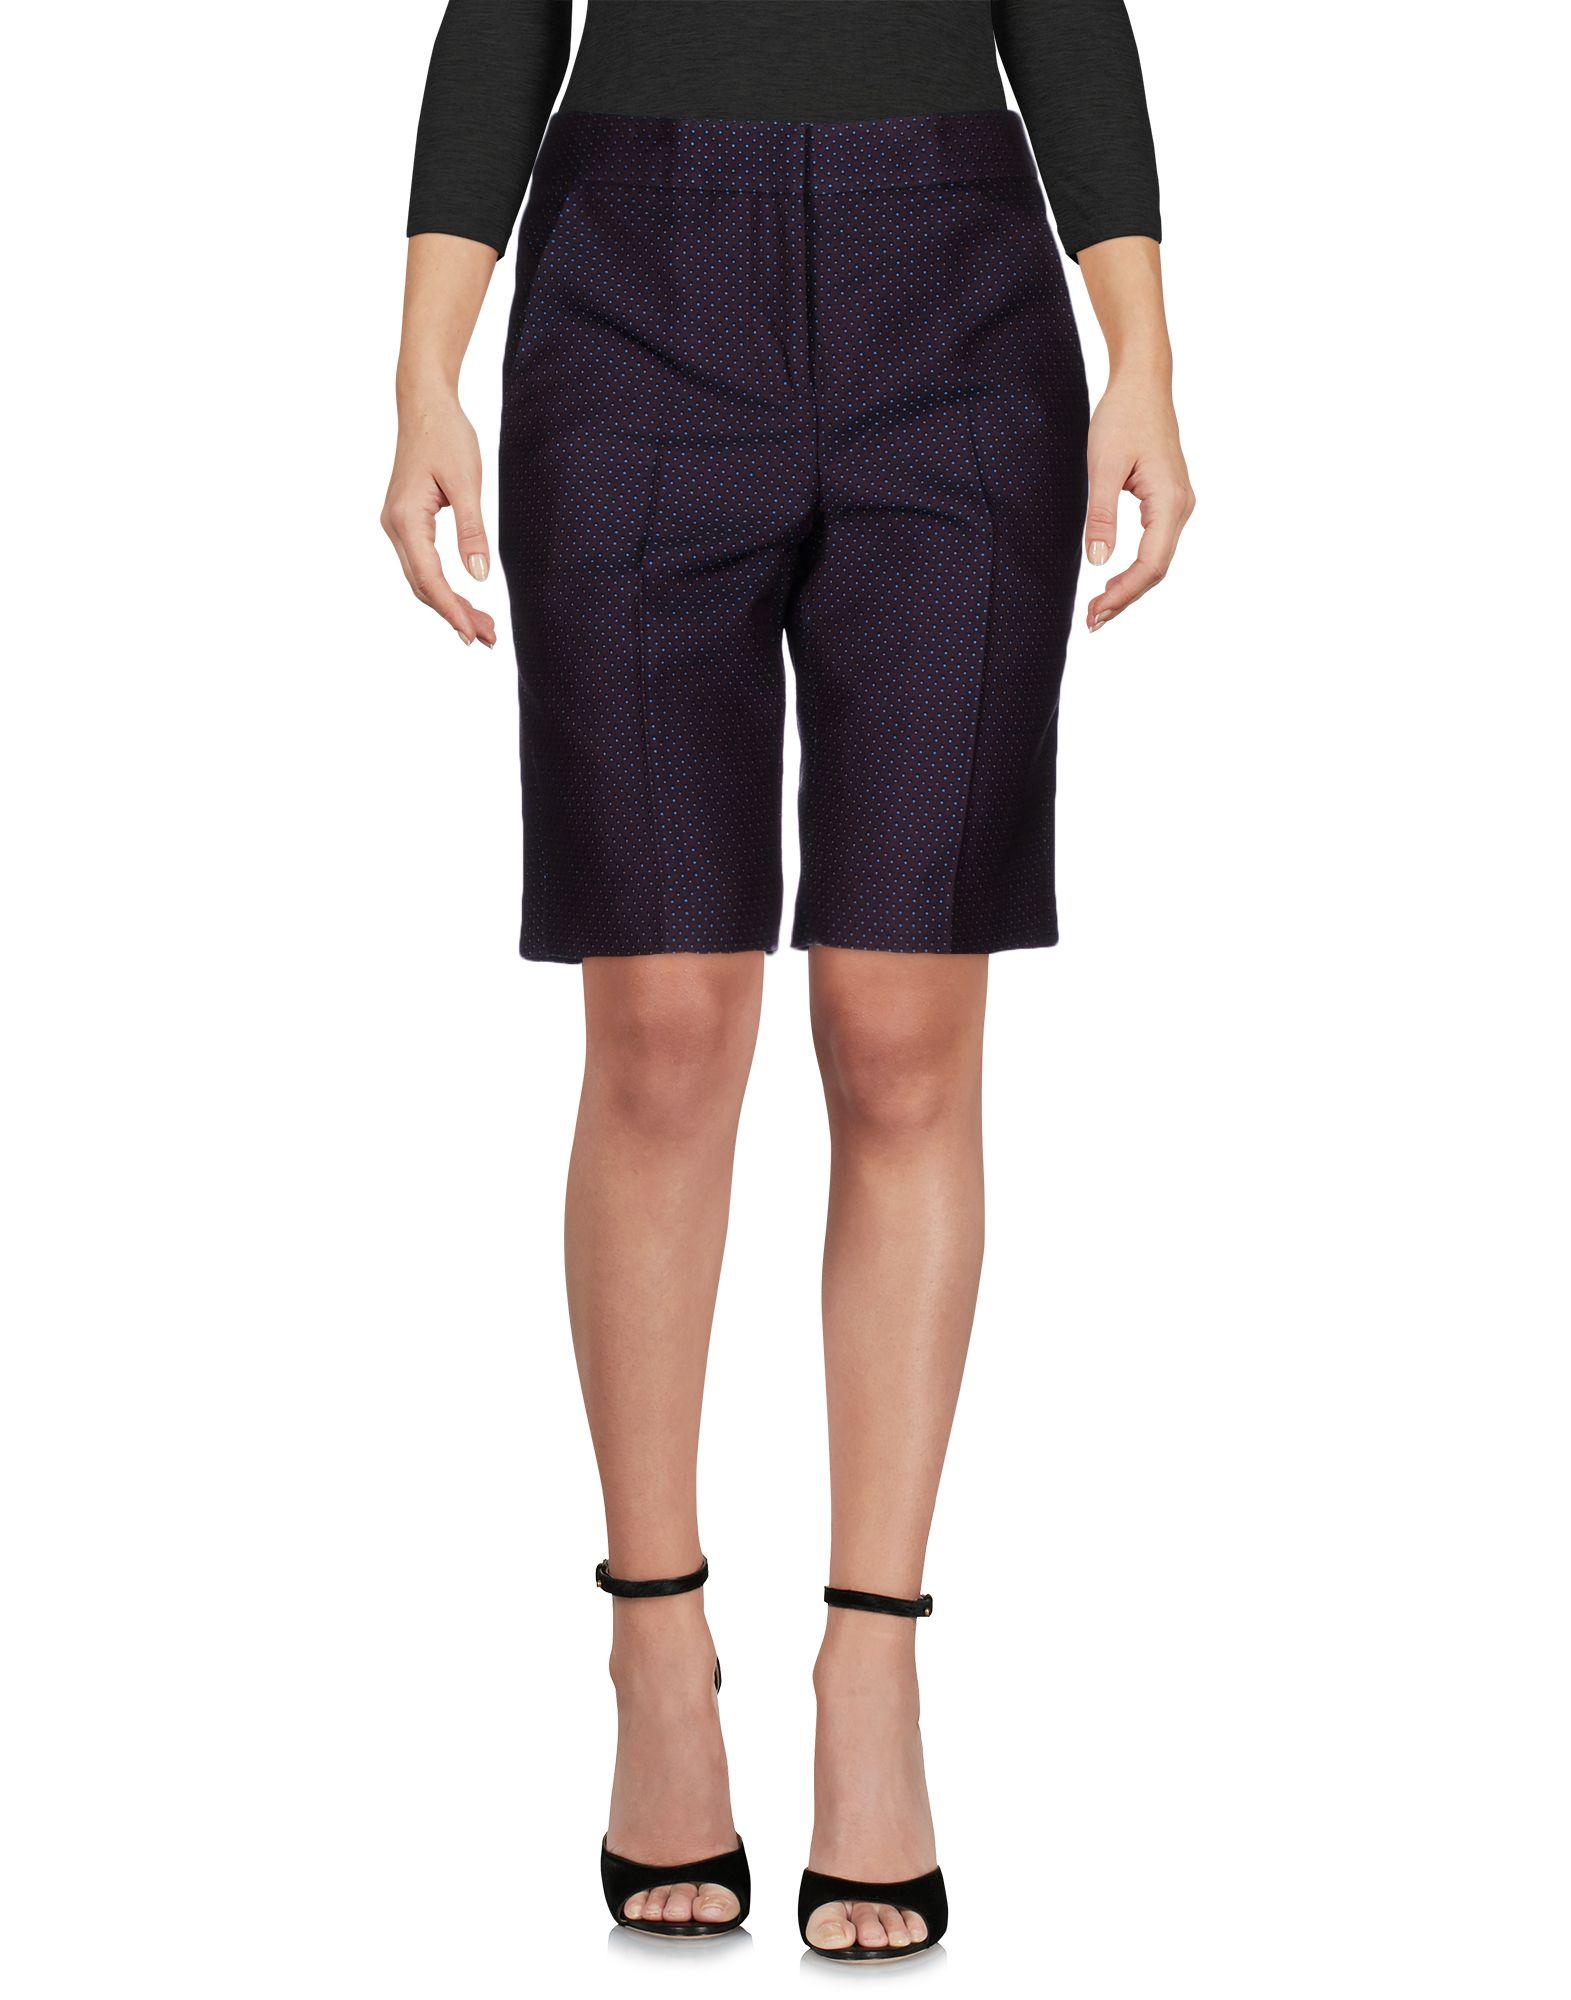 Pantalone Classico Alexander Alexander Wang donna - 36892409FN  klassischer Stil